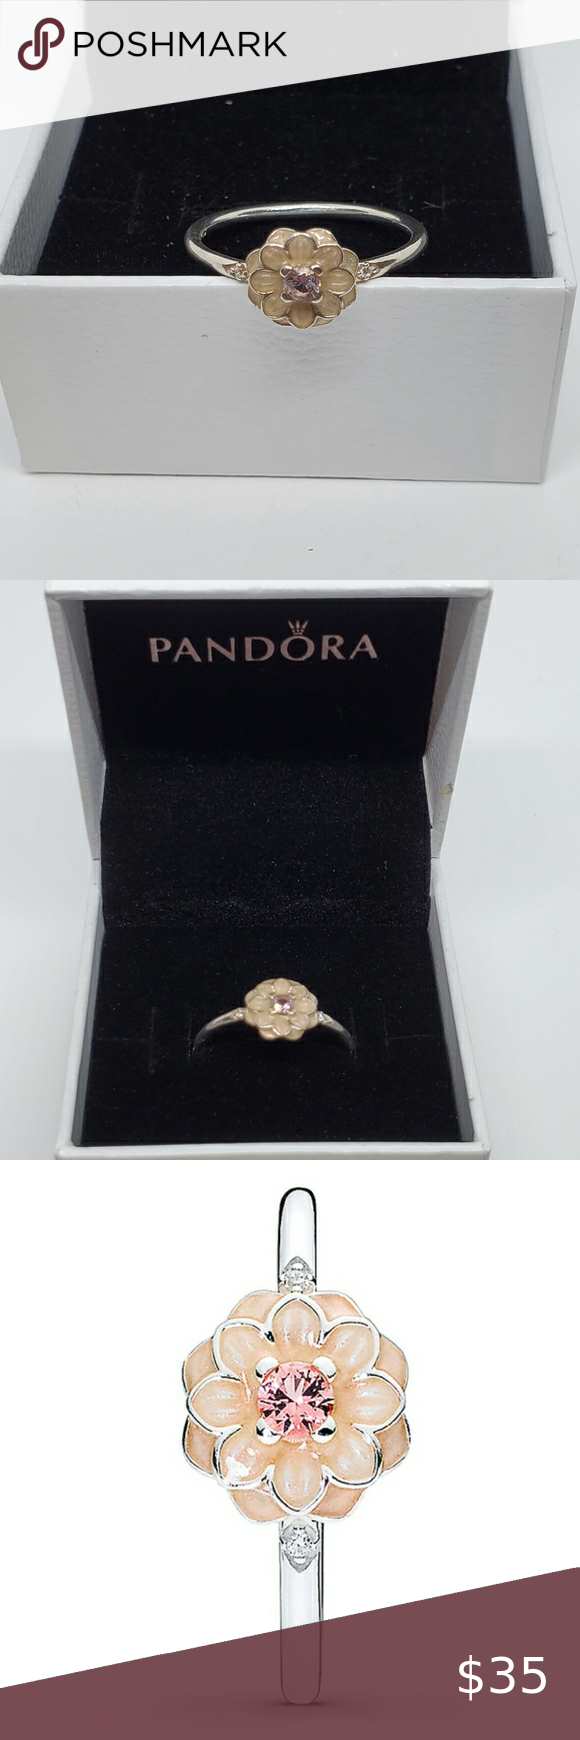 Pandora Dahlia Flower Ring 190985nbp 58 8 5 In 2020 Flower Ring Dahlia Flower Womens Jewelry Rings